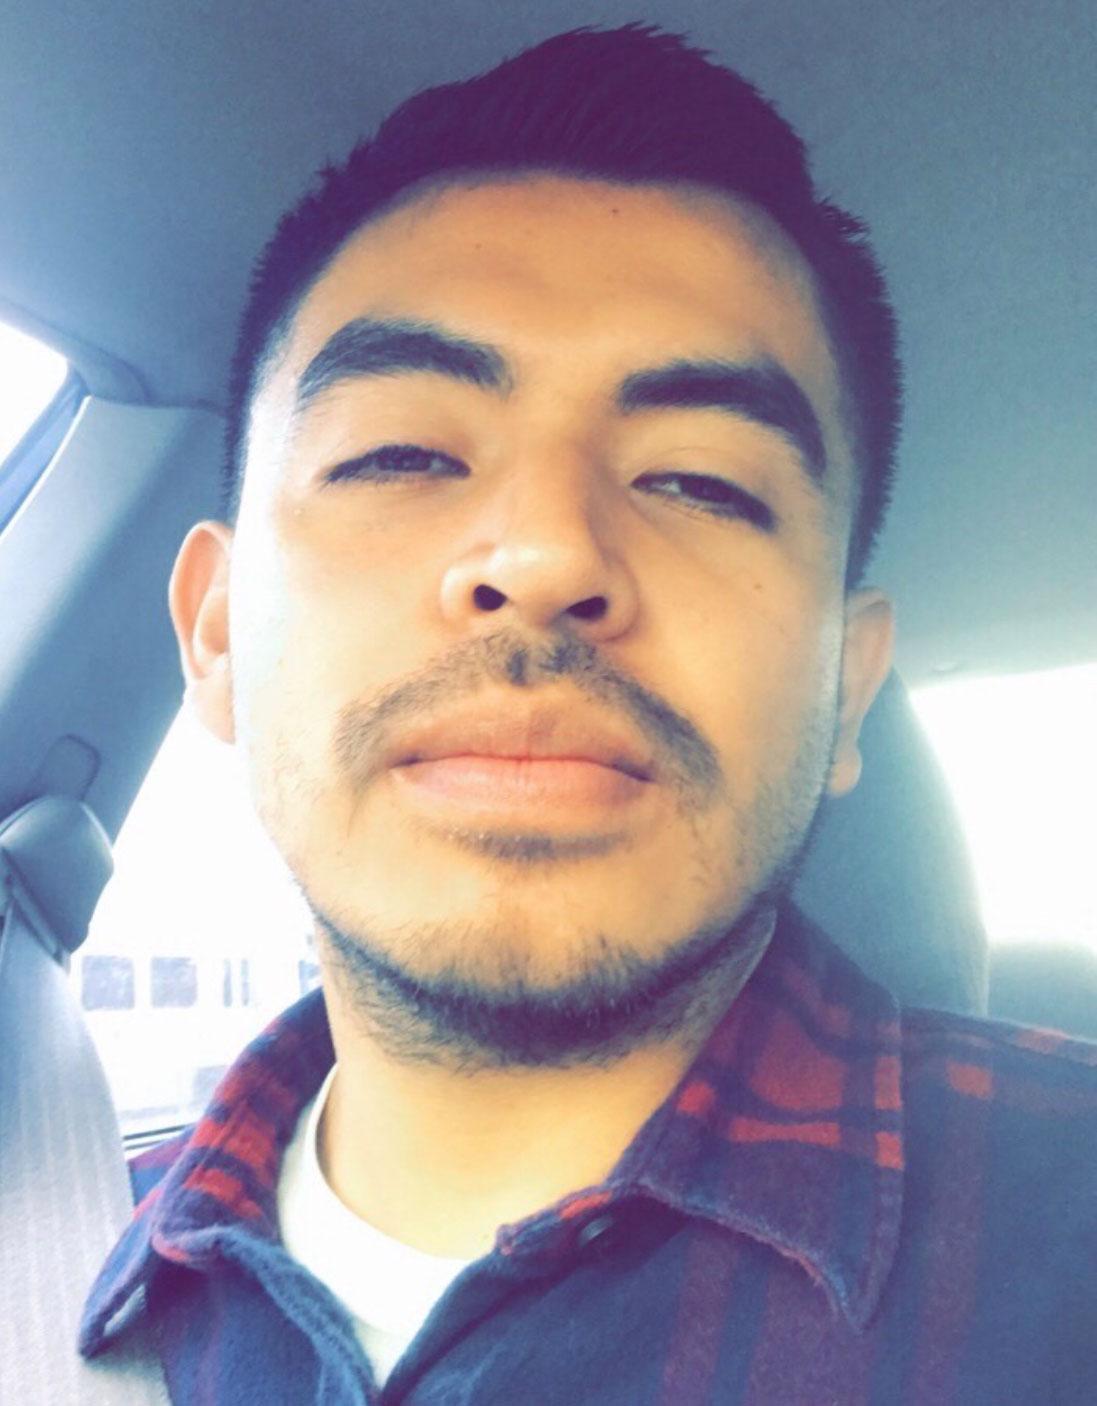 Headshot of Elias Garcia in the car wearing a plaid shirt.